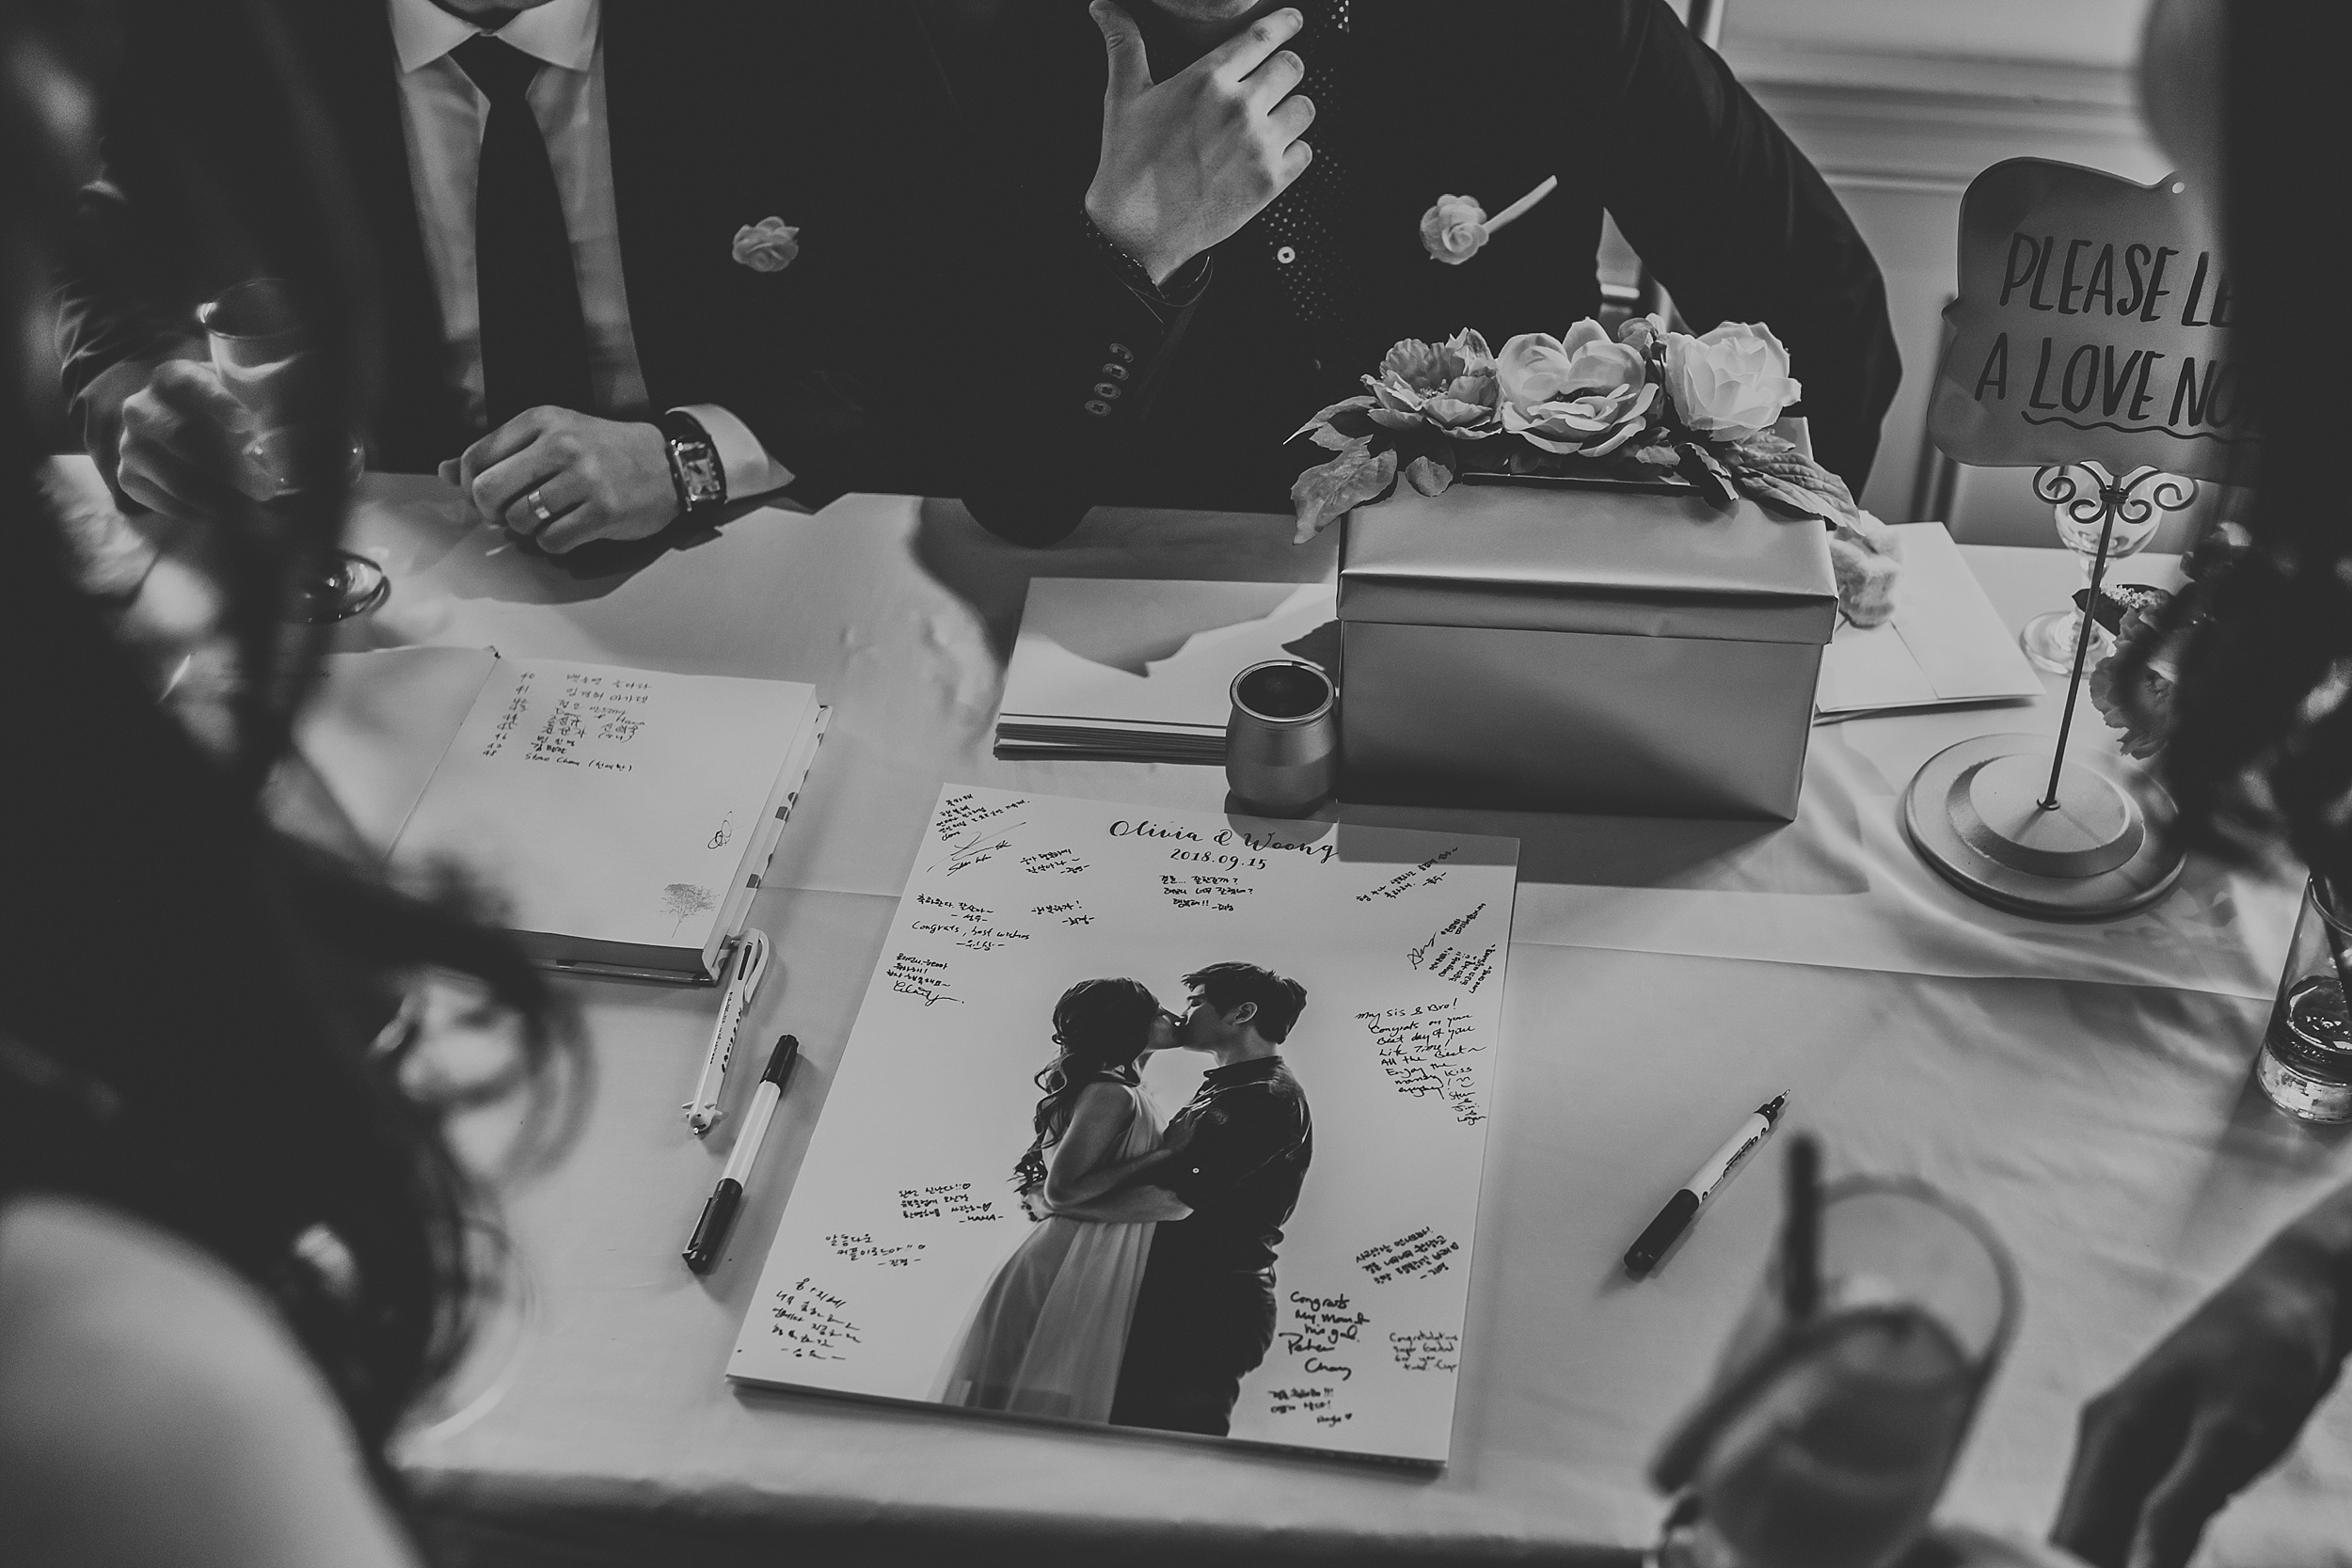 Doctors_House_Kleinburg_Wedding_Toronto_Photographer_0064.jpg